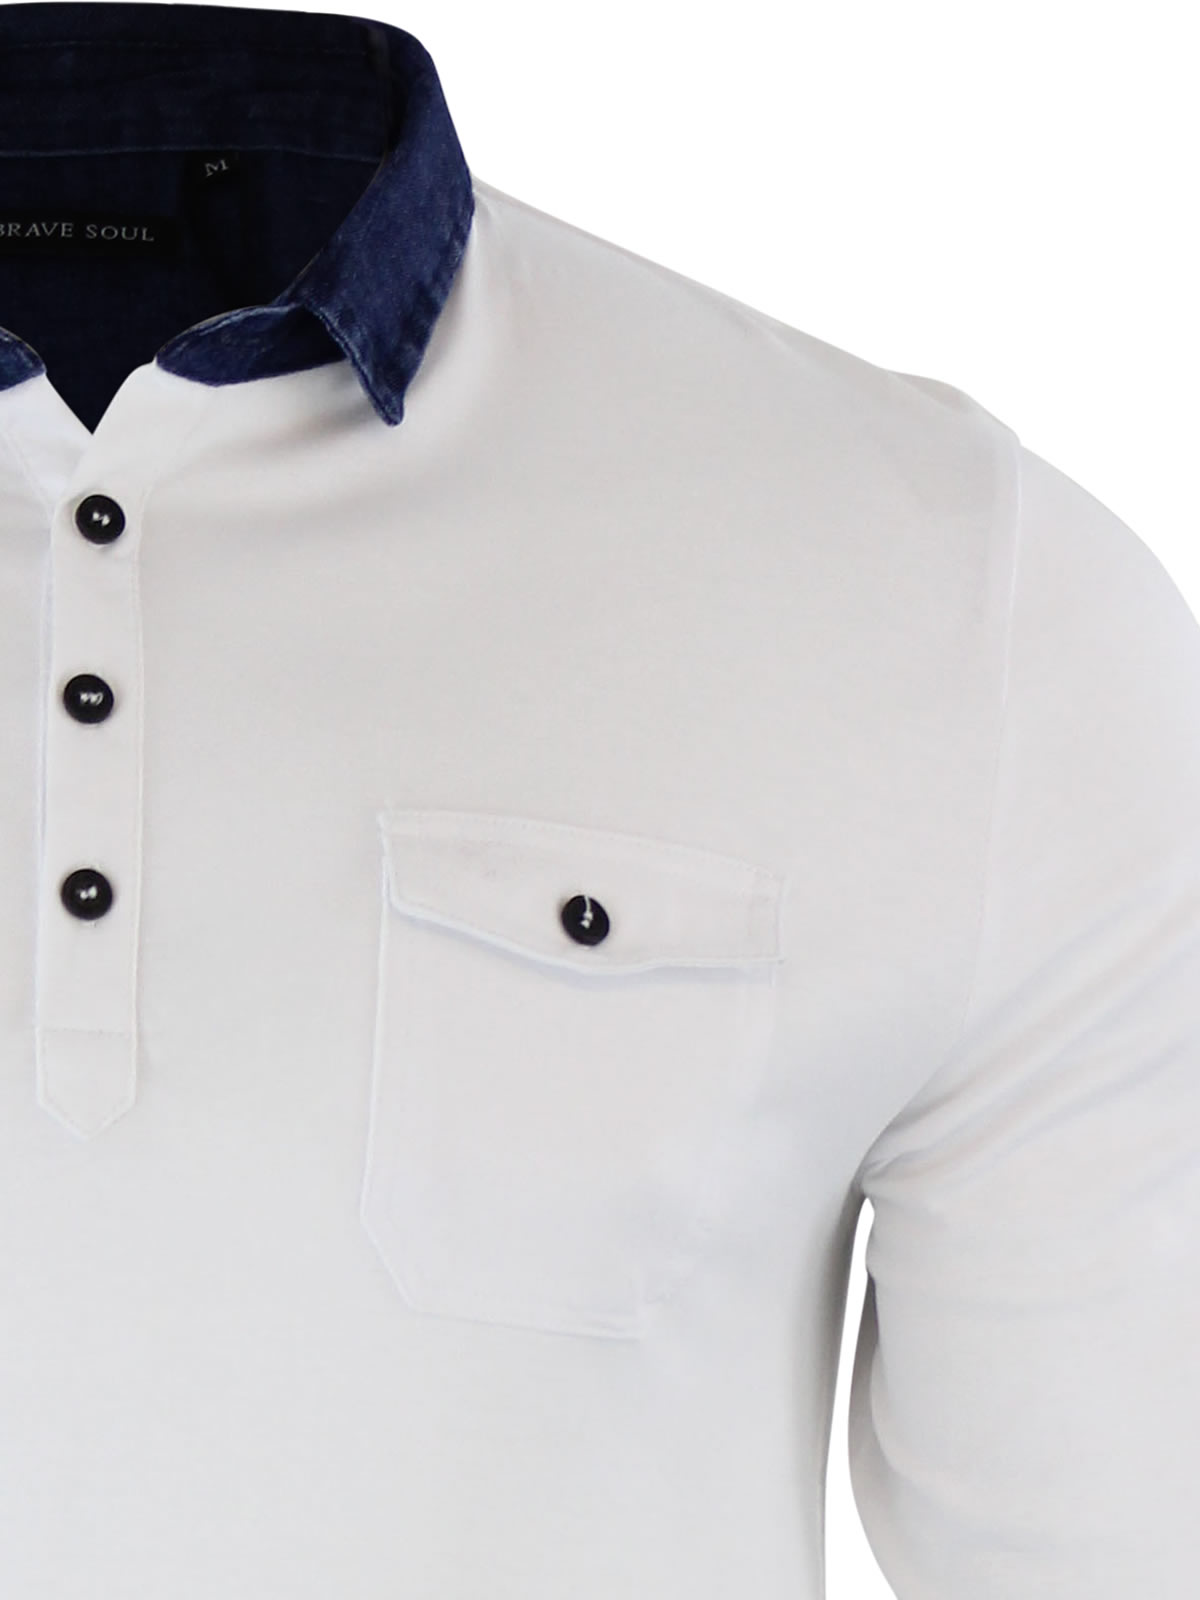 Mens-Polo-T-Shirt-Brave-Soul-Gospel-Denim-Collared-Long-Sleeve-Casual-Top thumbnail 10